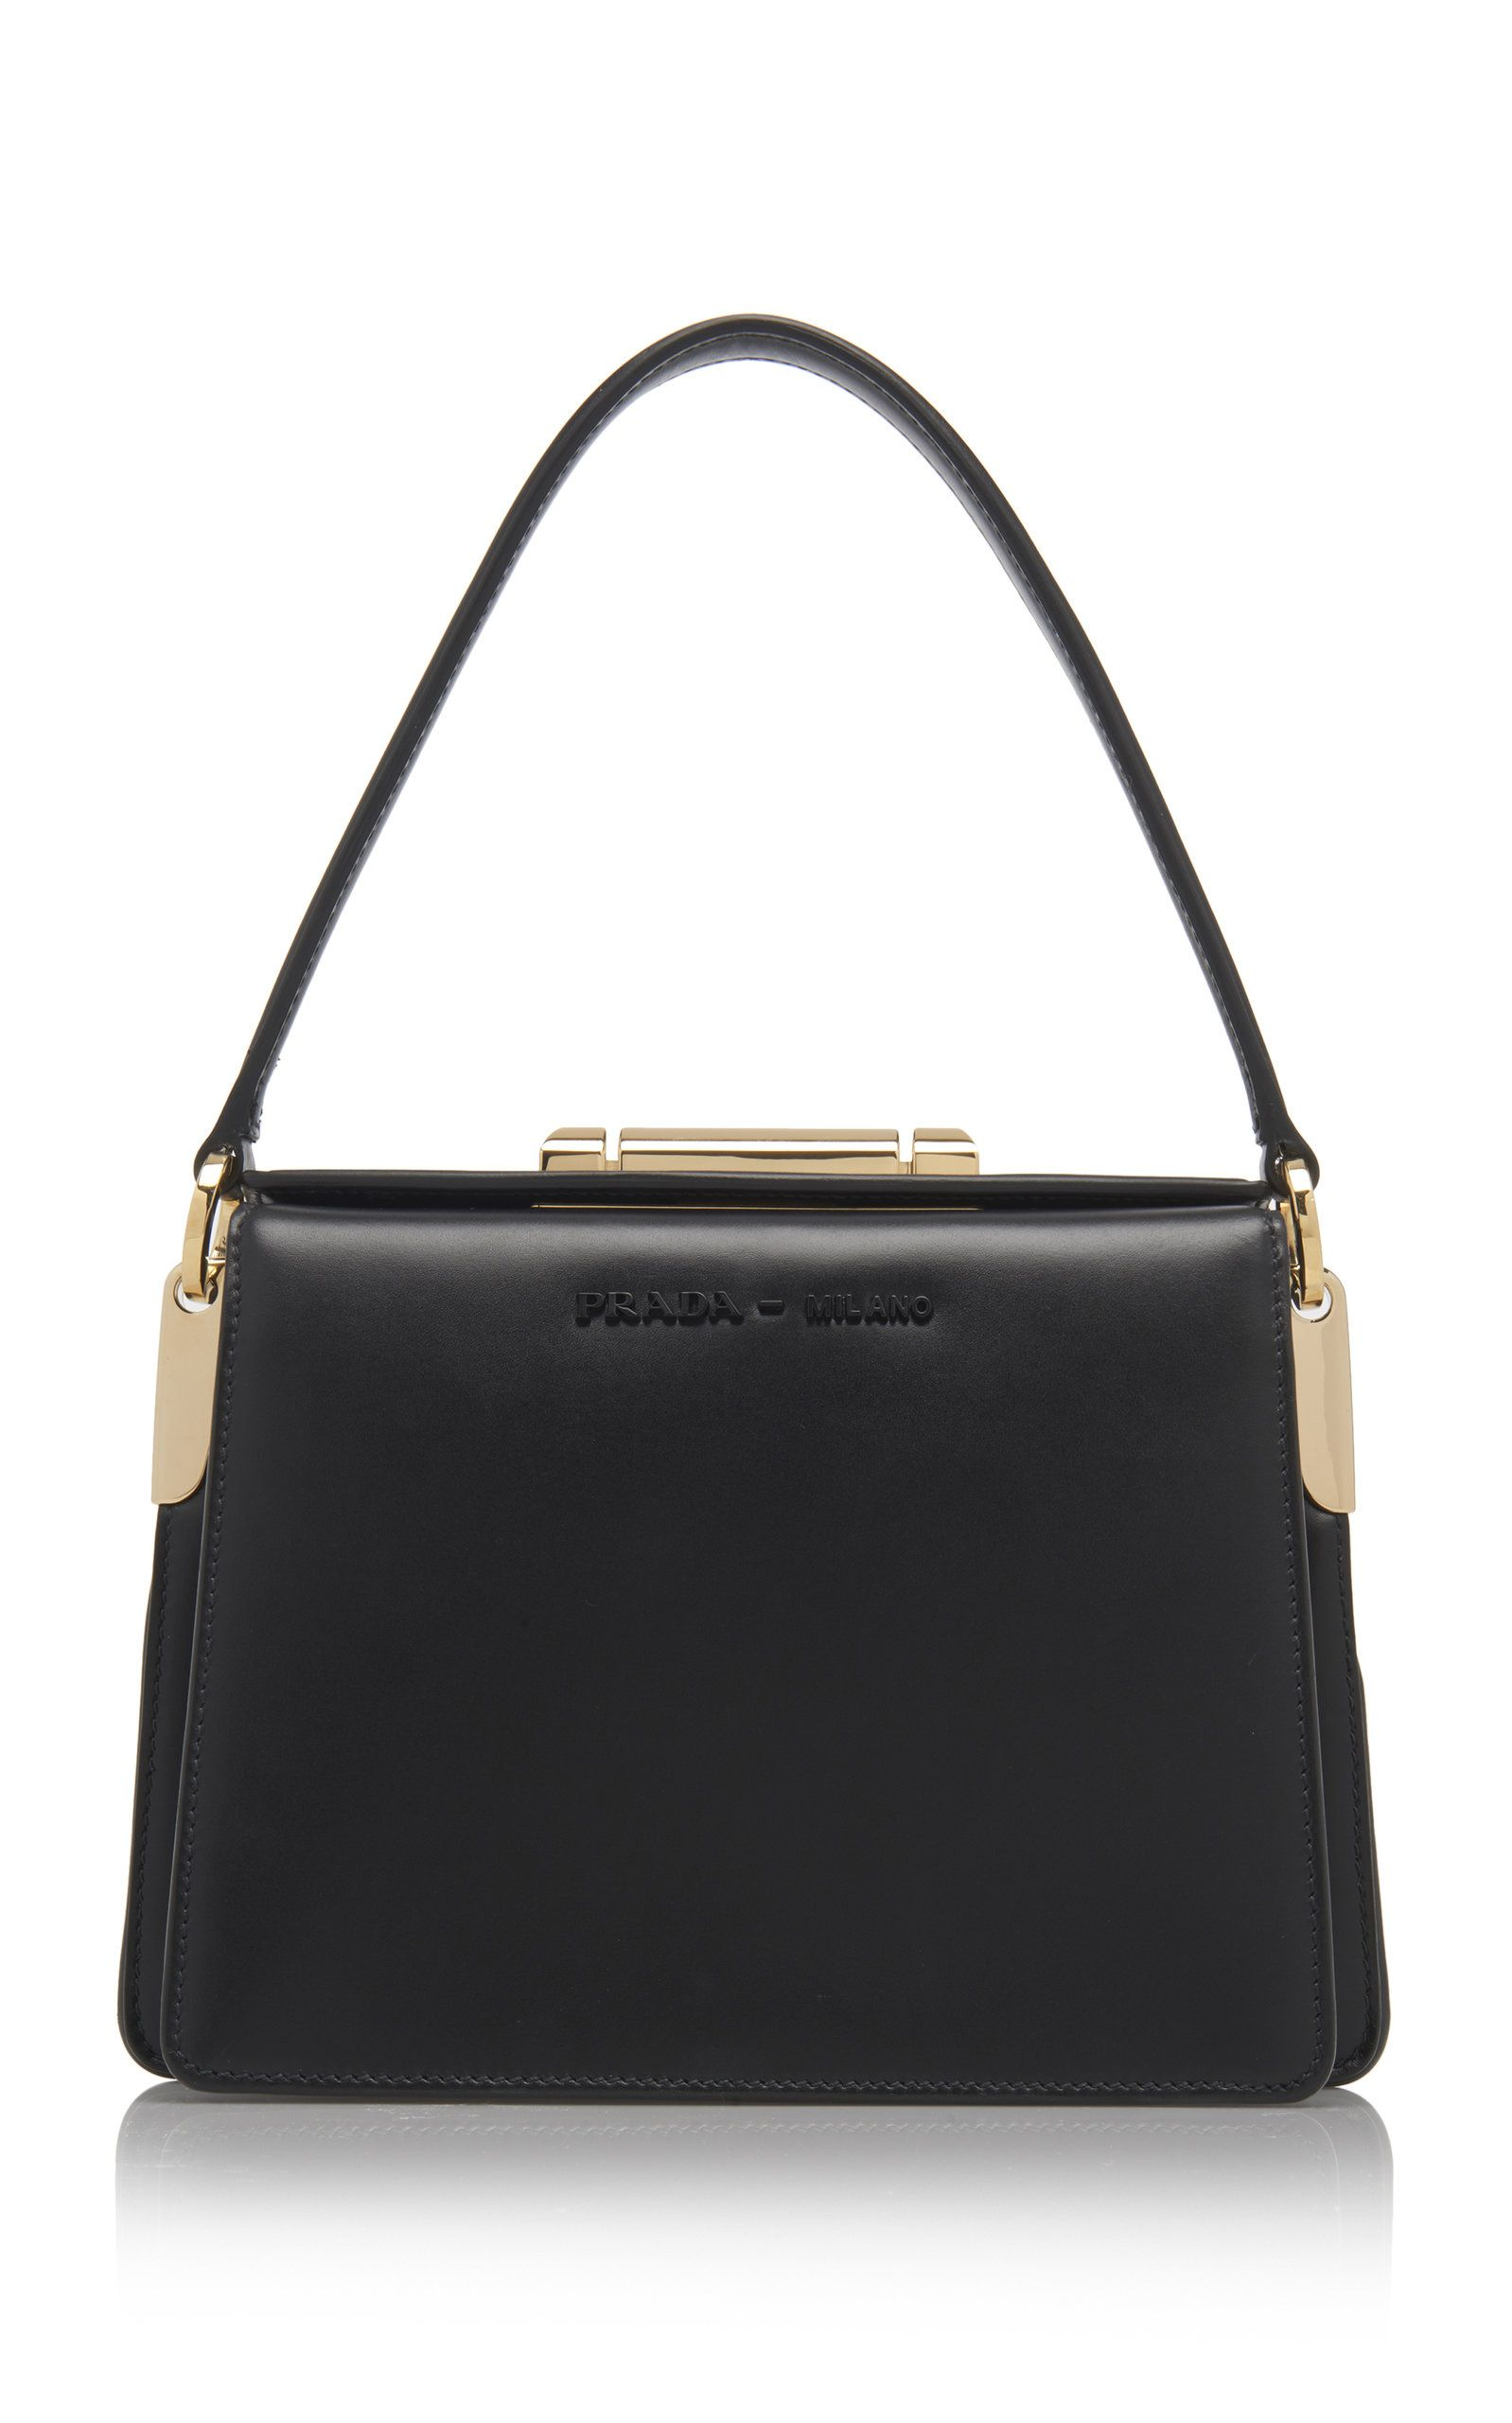 92813980180f Prada Leather Shoulder Bag in 2019 | fashion2 | Bags, Leather ...